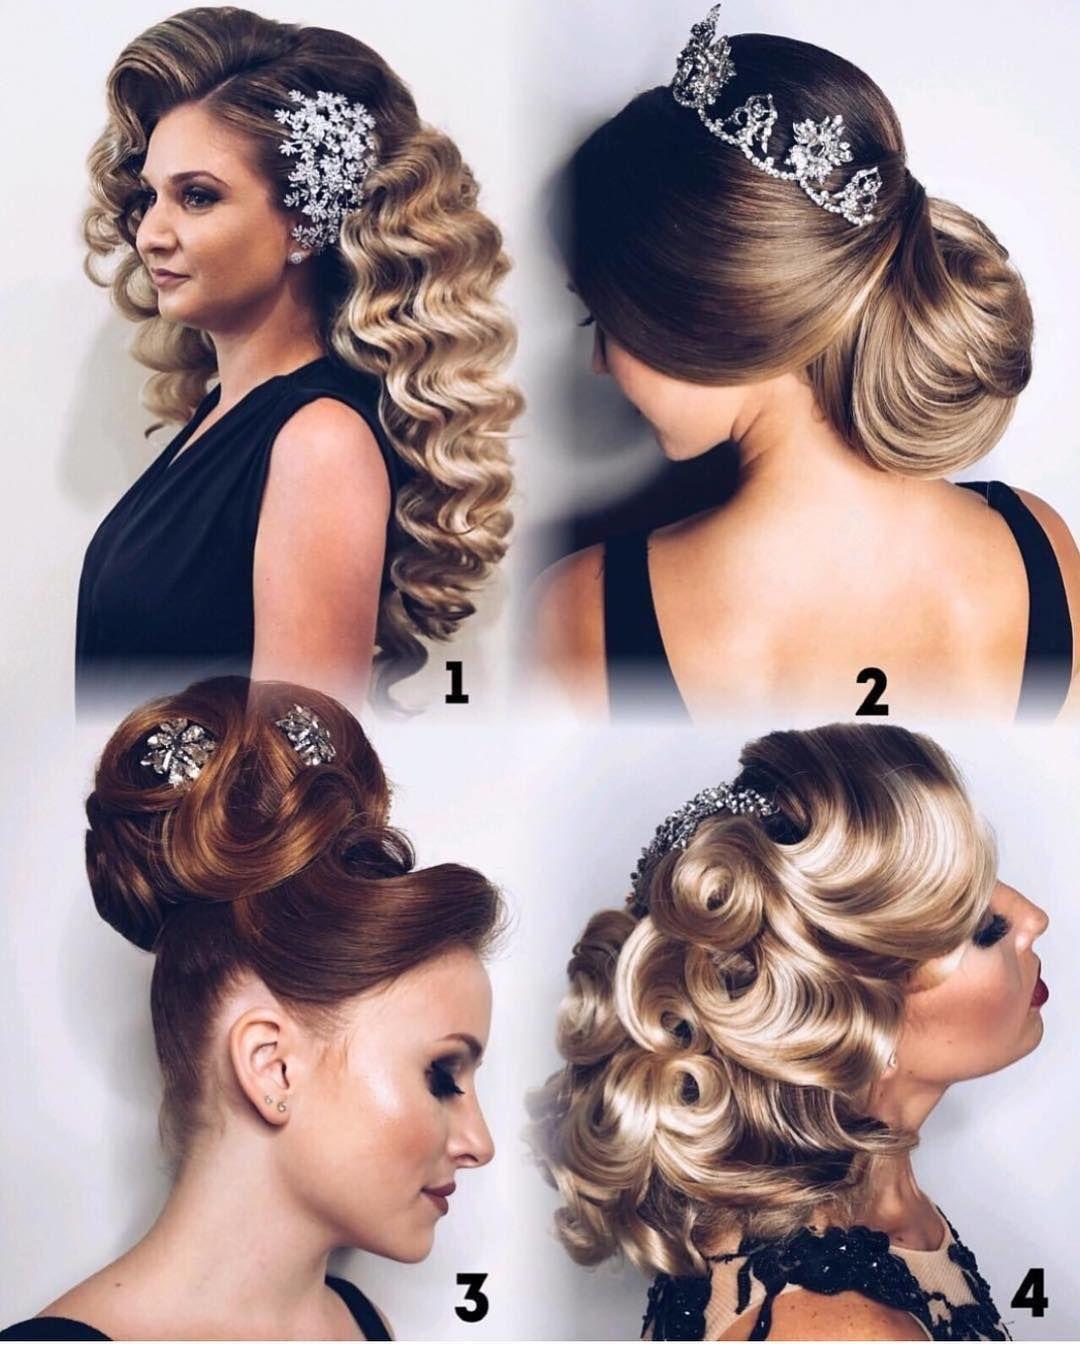 Wedding Hairstyle Hashtags: #nwchoosefav😍 Hashtag On Instagram • Photos And Videos